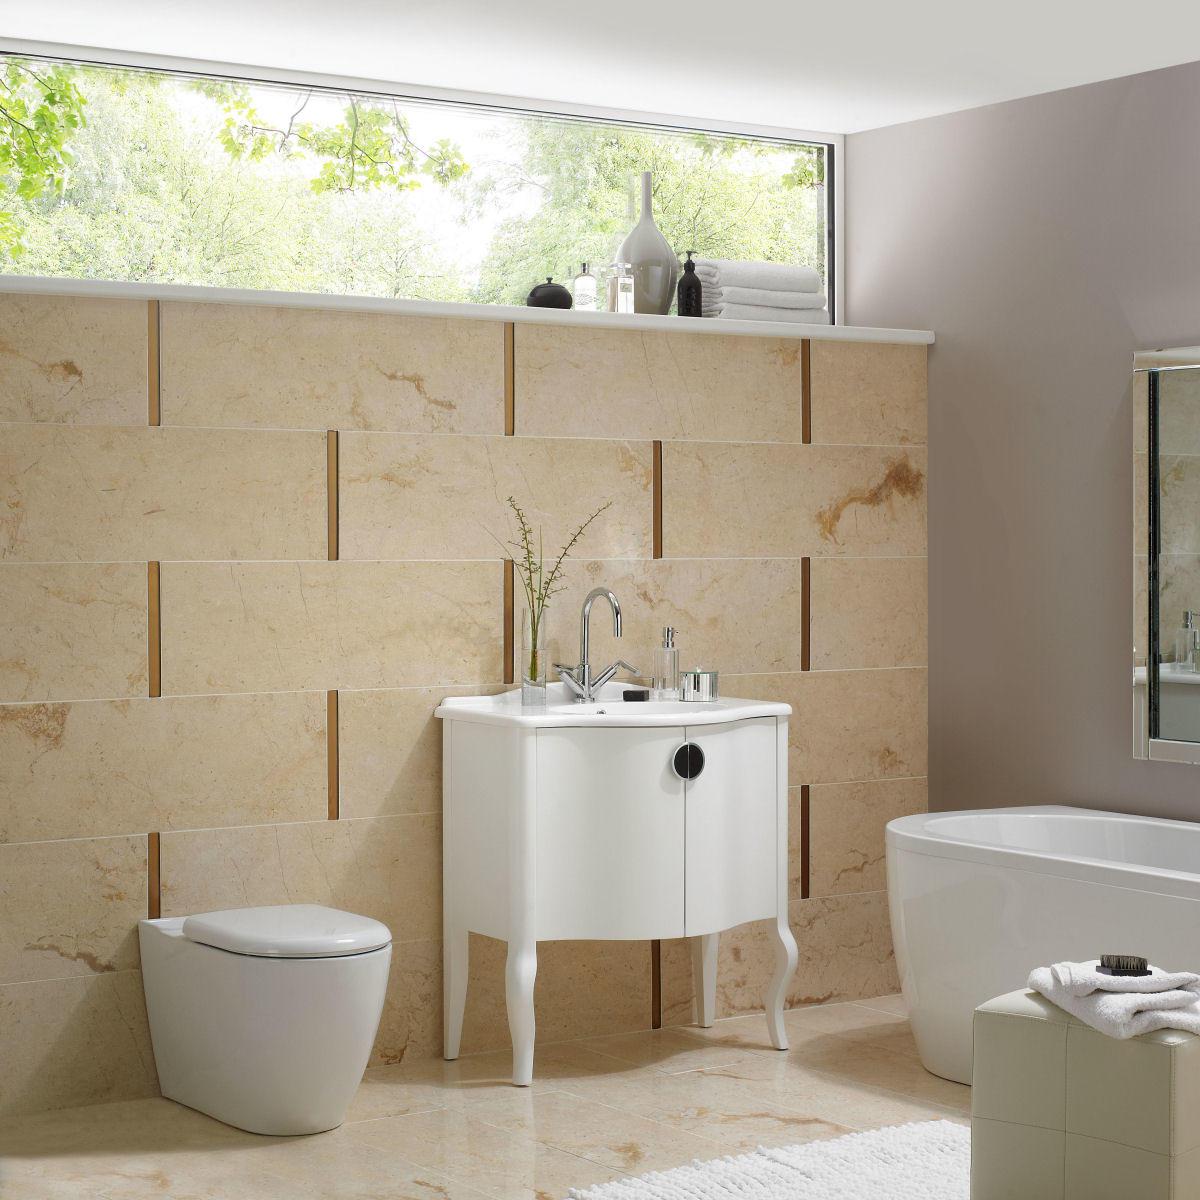 Cream bathroom vanity amazing bathroom vanity images for Cream and black bathroom ideas